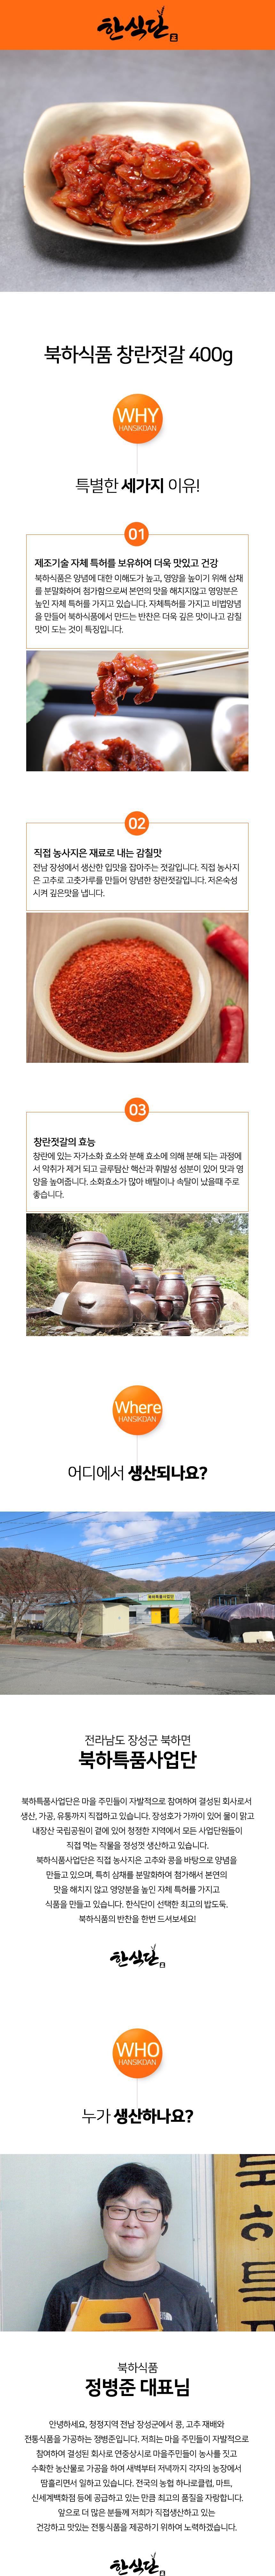 54_page_01_d.jpg